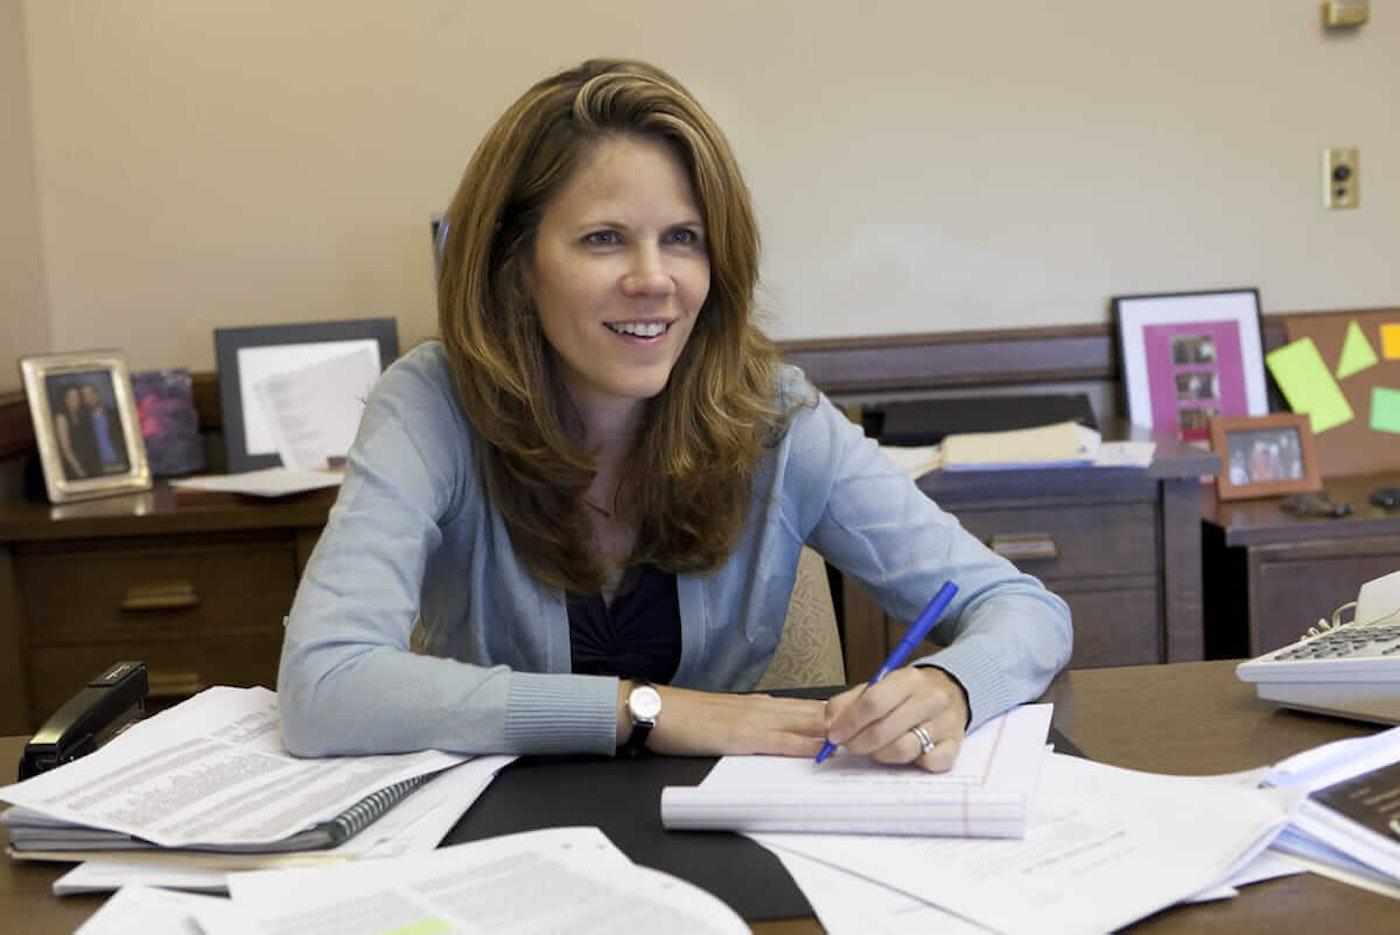 Rep. Chris Taylor to Replace Karofsky as Dane County Judge